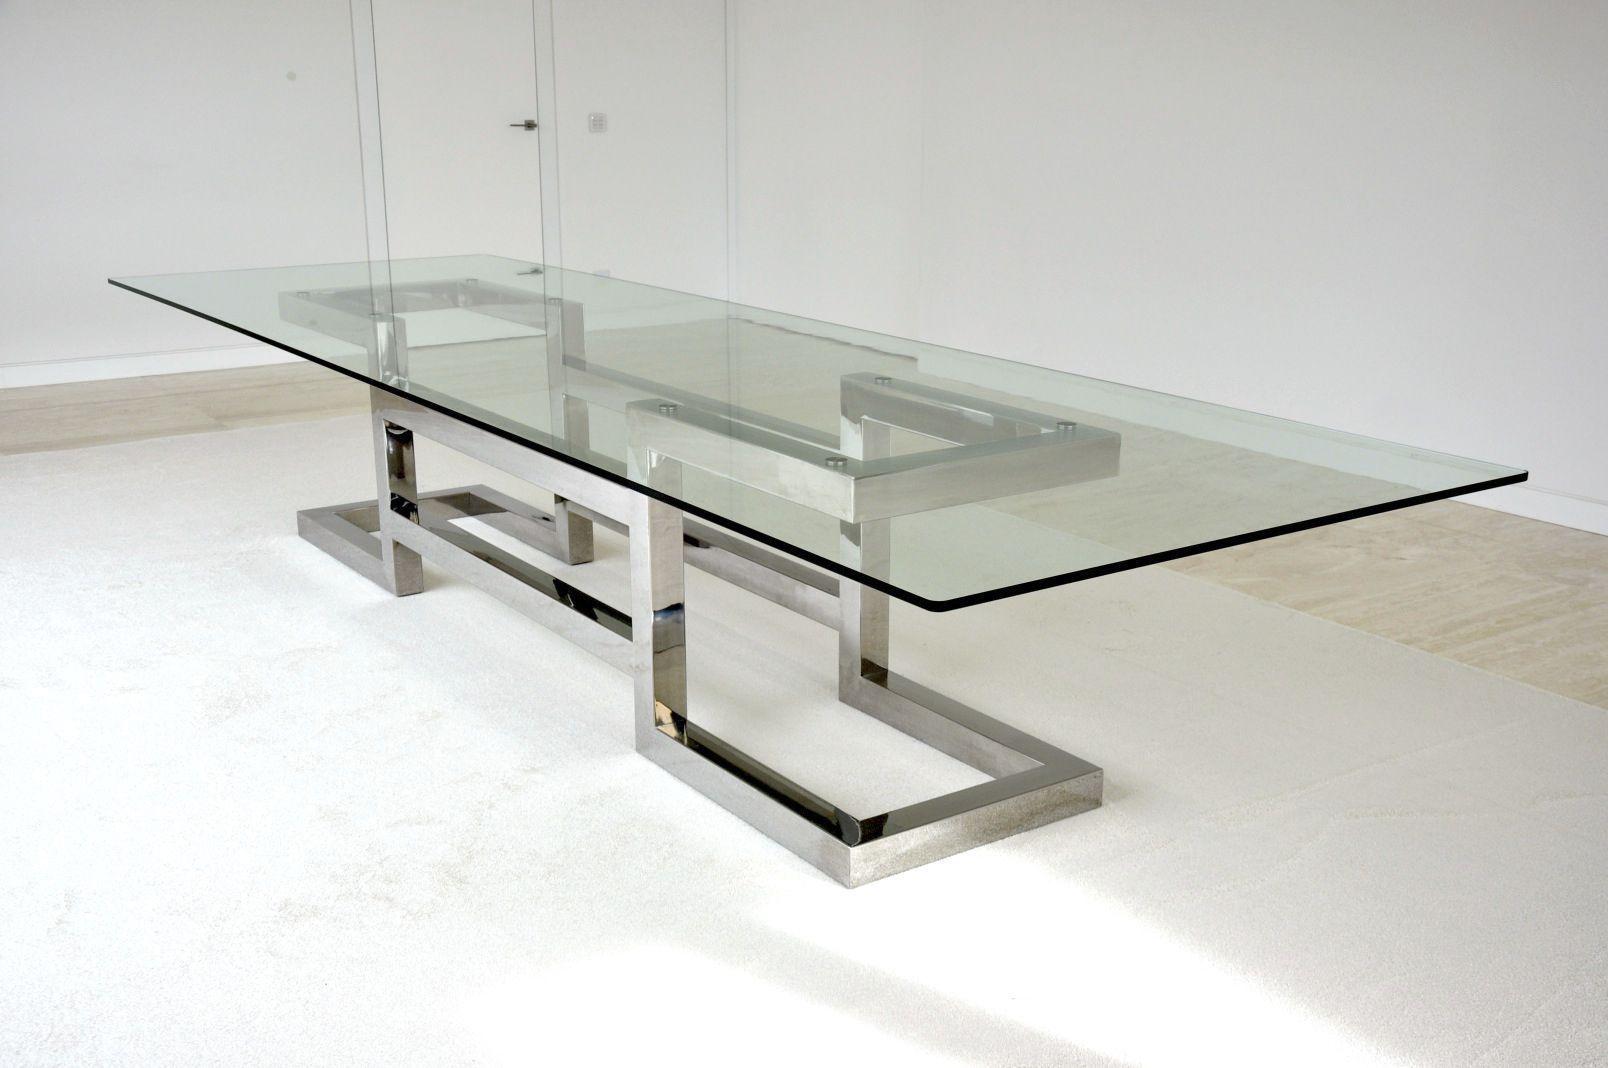 Mesa de reuniones moderna de cristal de hierro lisa - Mesas de vidrio modernas ...